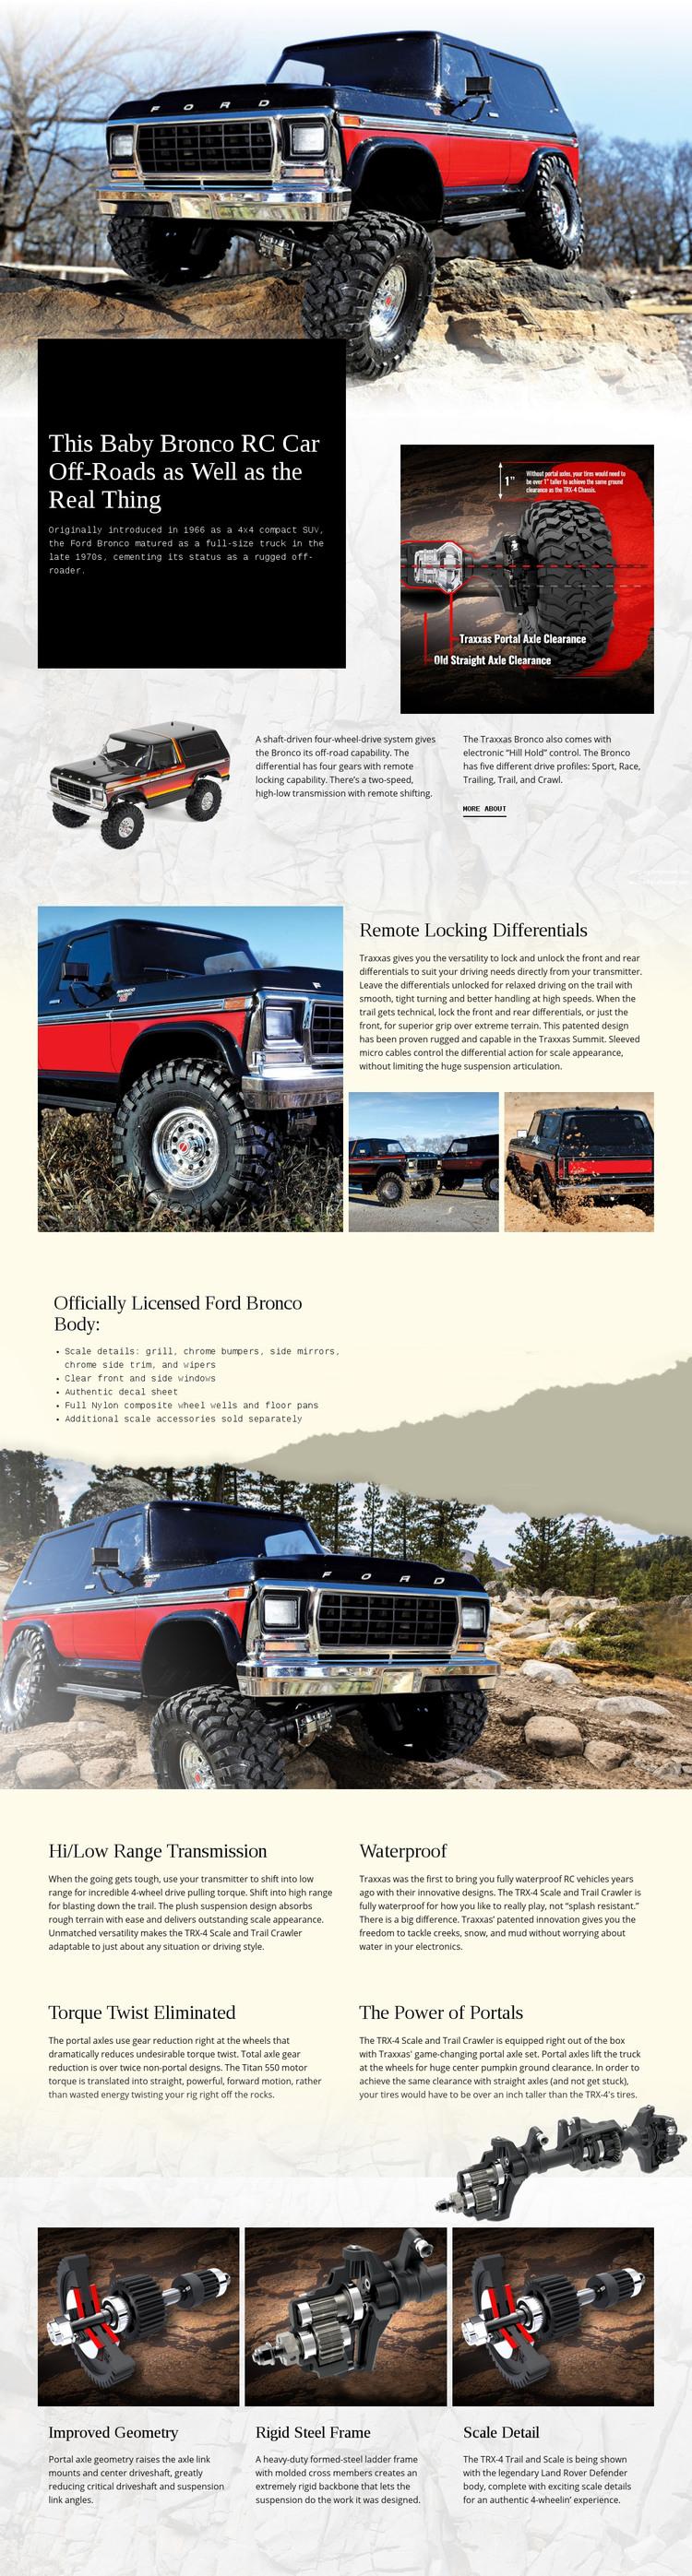 Bronco Rc Car Homepage Design